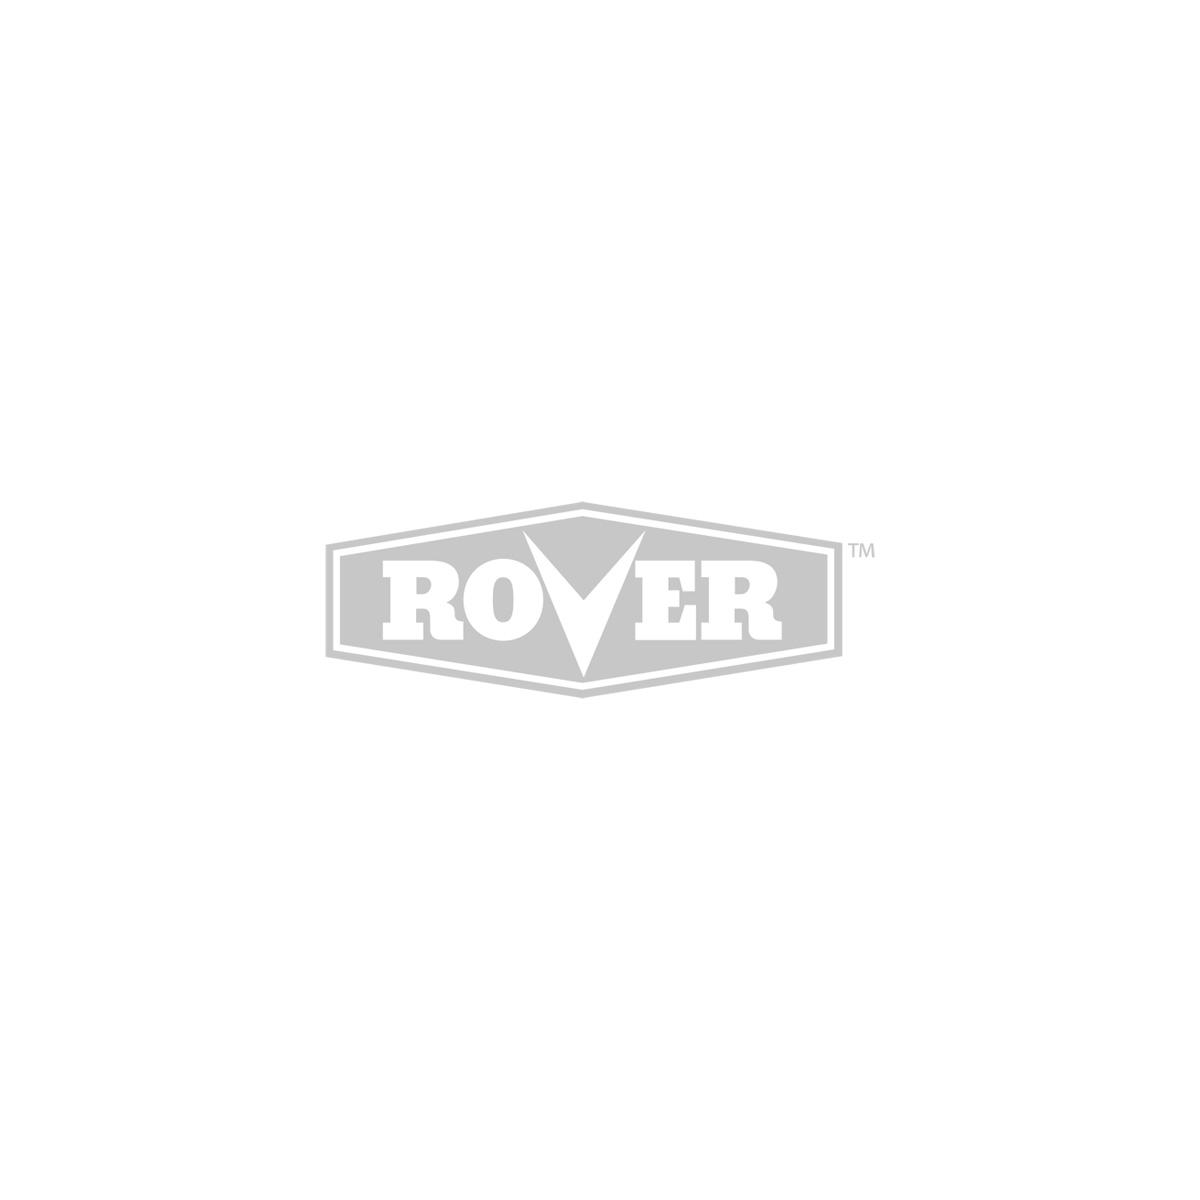 hight resolution of 382cc rover engine